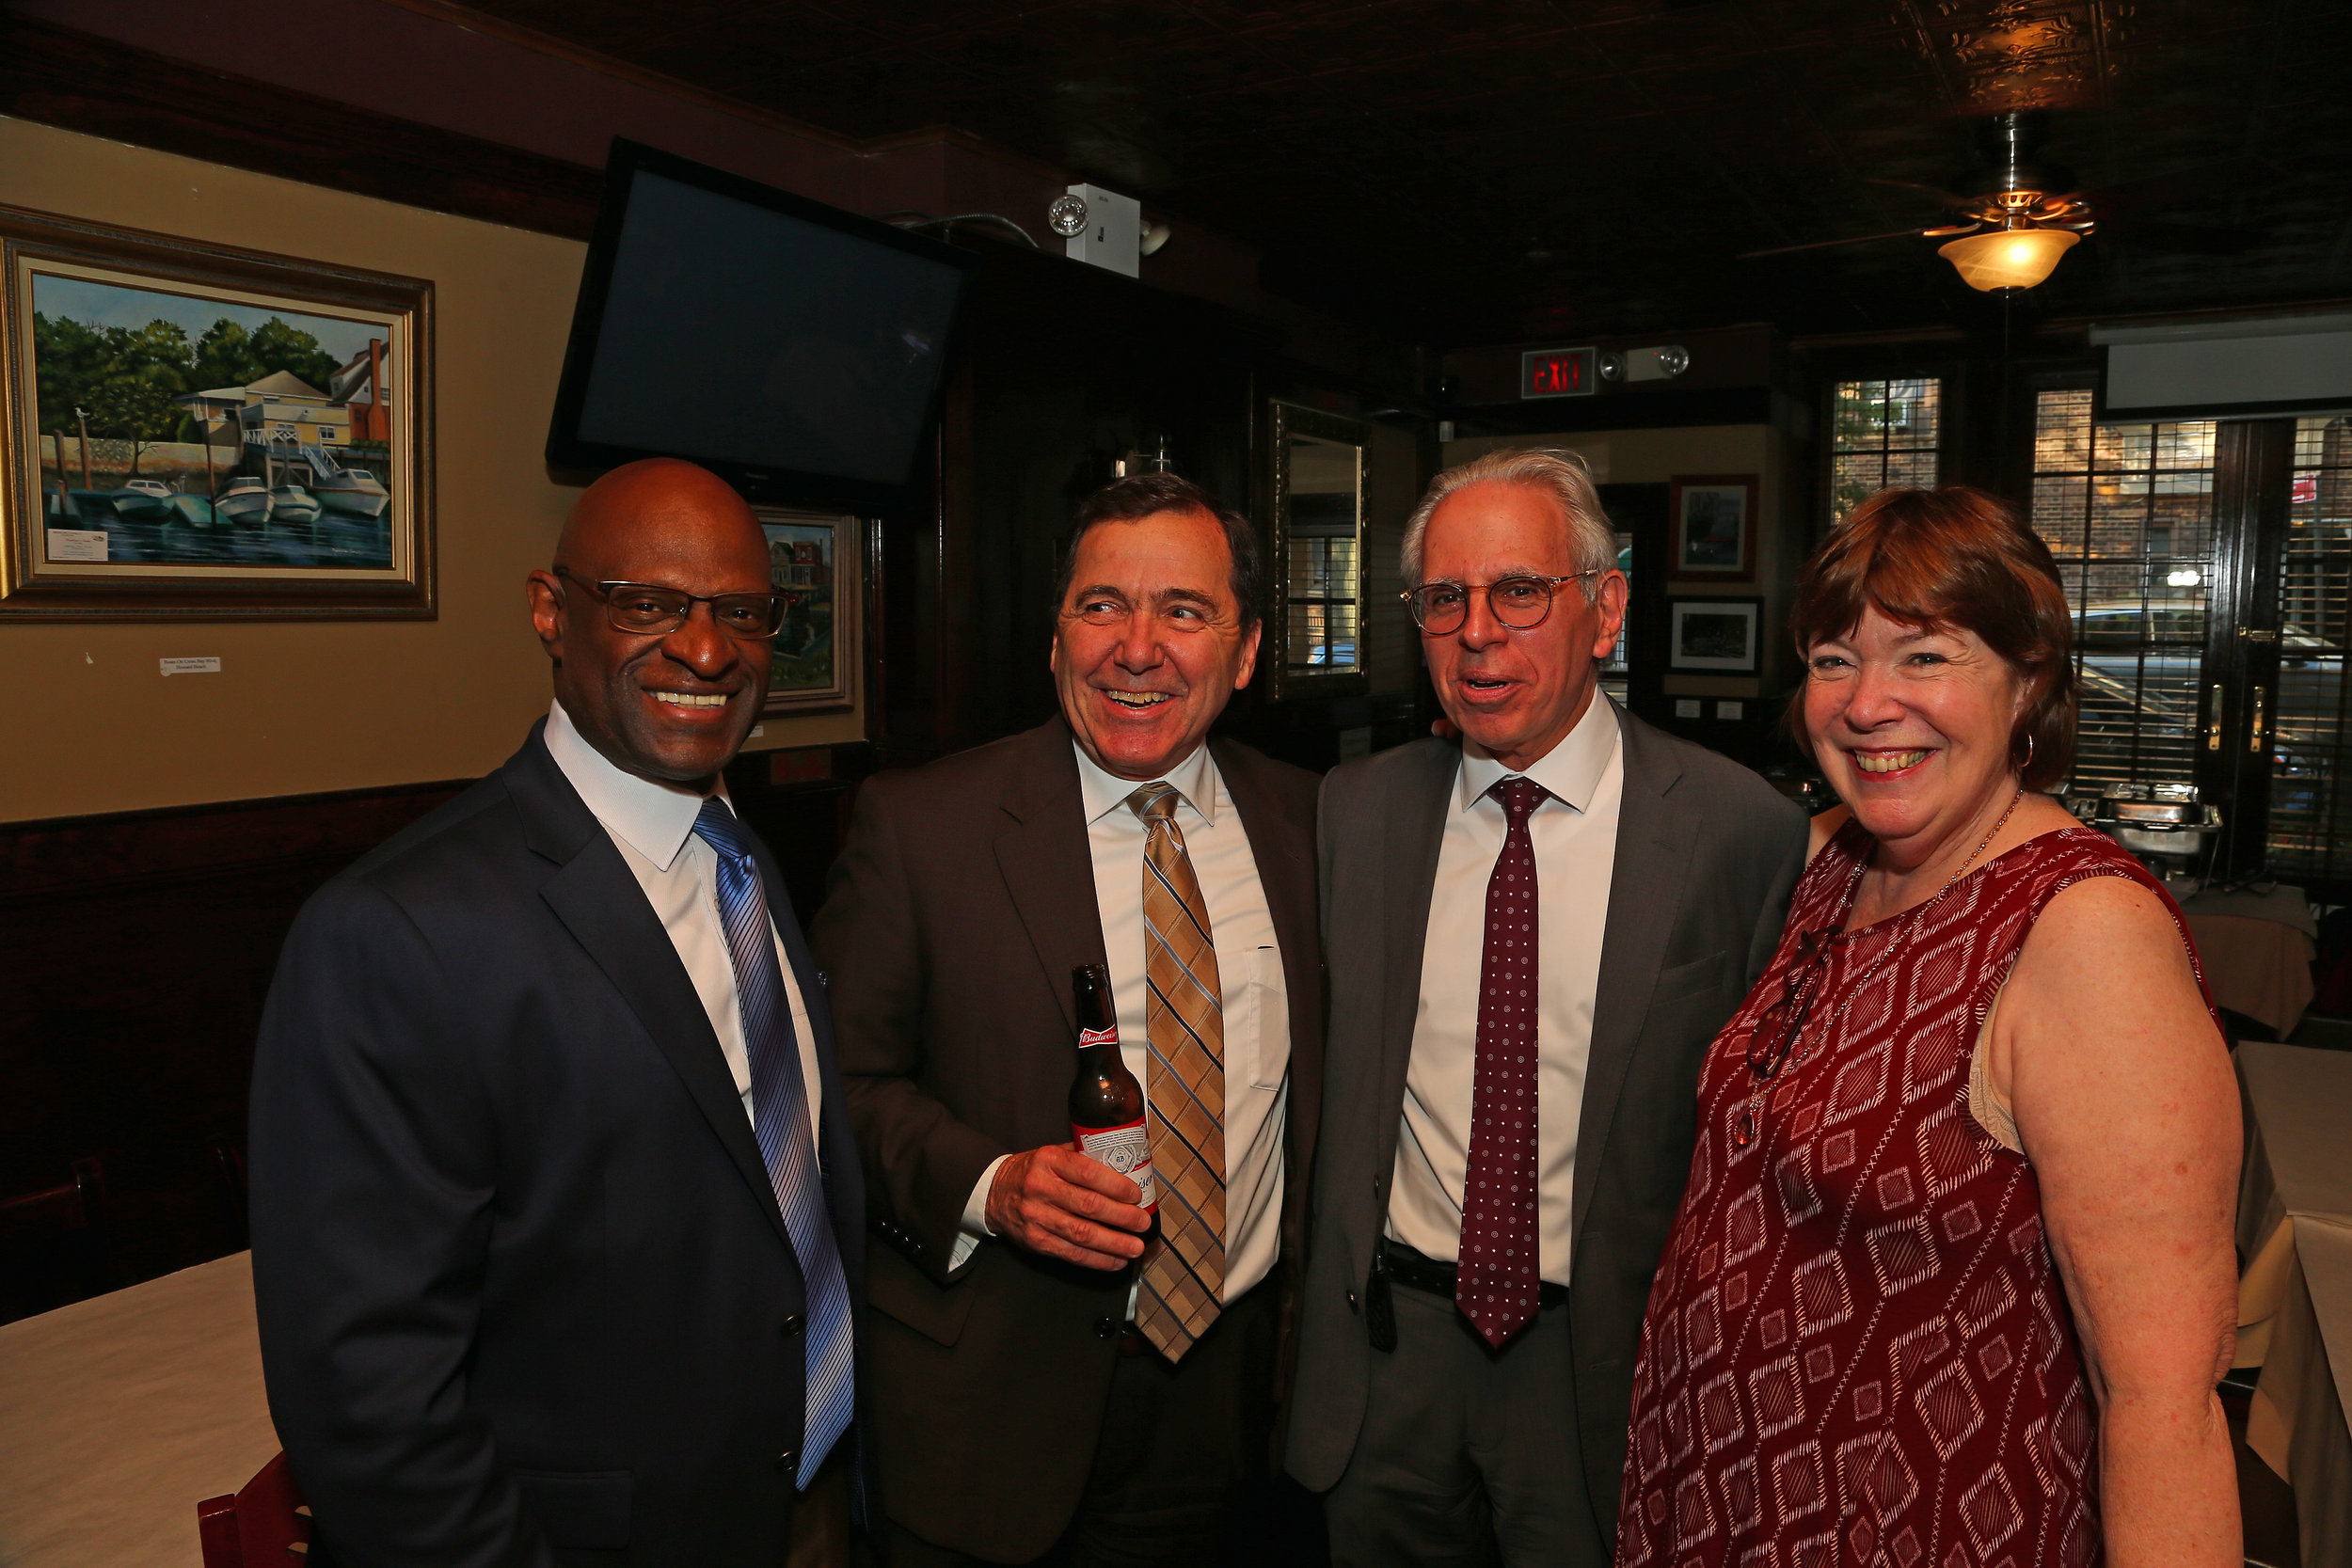 From left, the Hon. Kenneth Holder, Executive ADA James Quinn, Charles Testagarossa and the Hon. Deborah Modica.